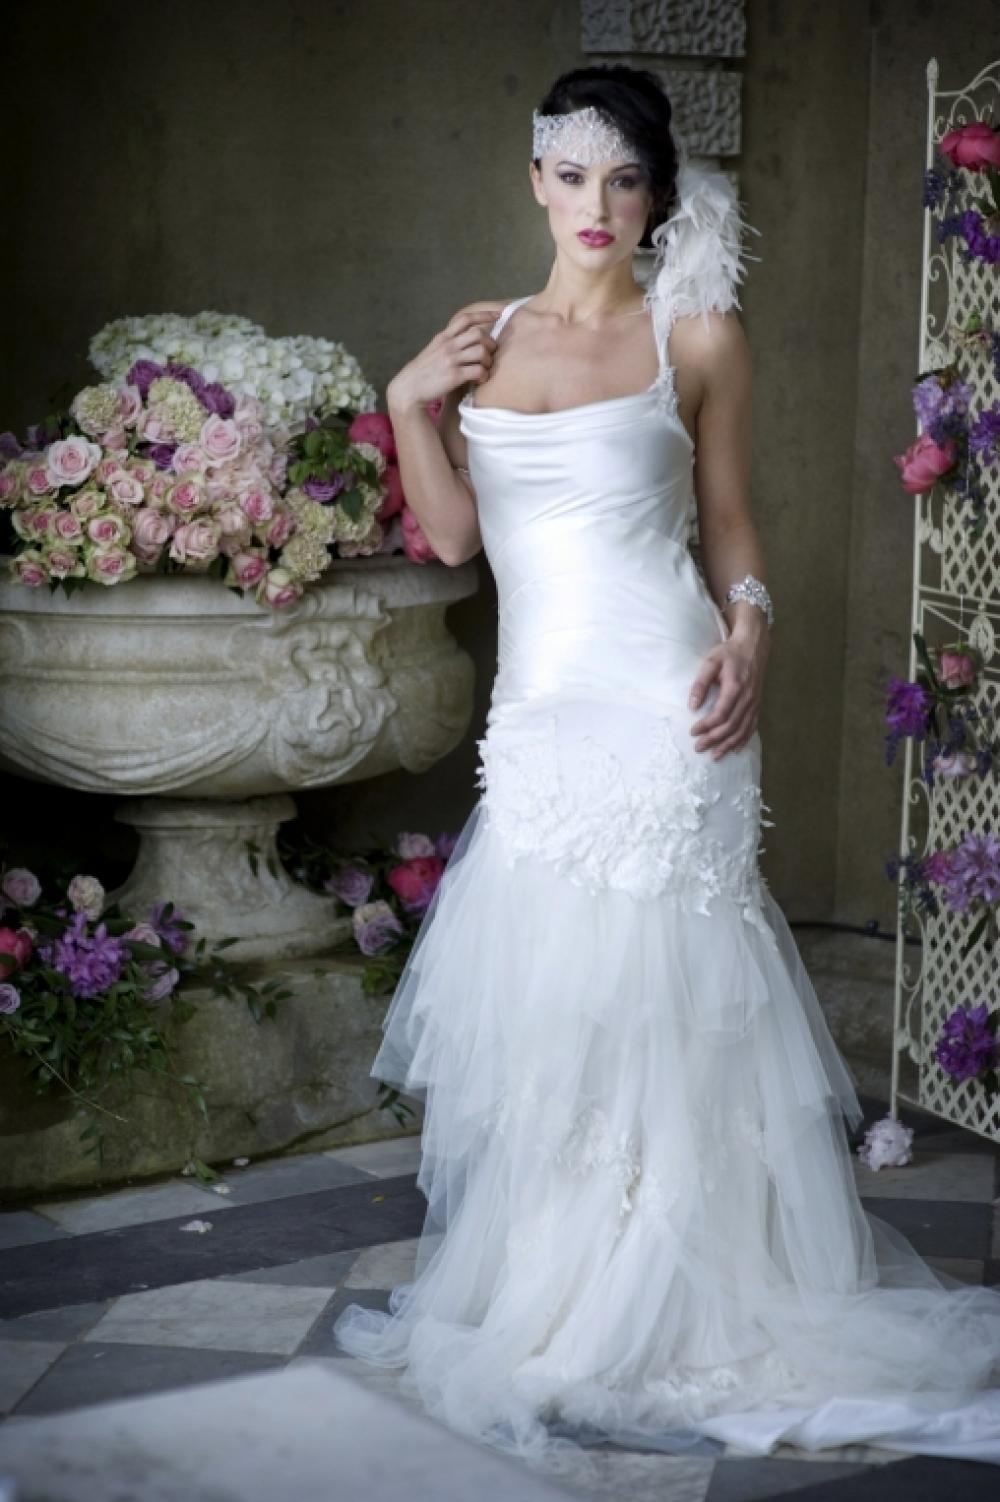 Designer Dress Sale at The White Room Bridal Boutique